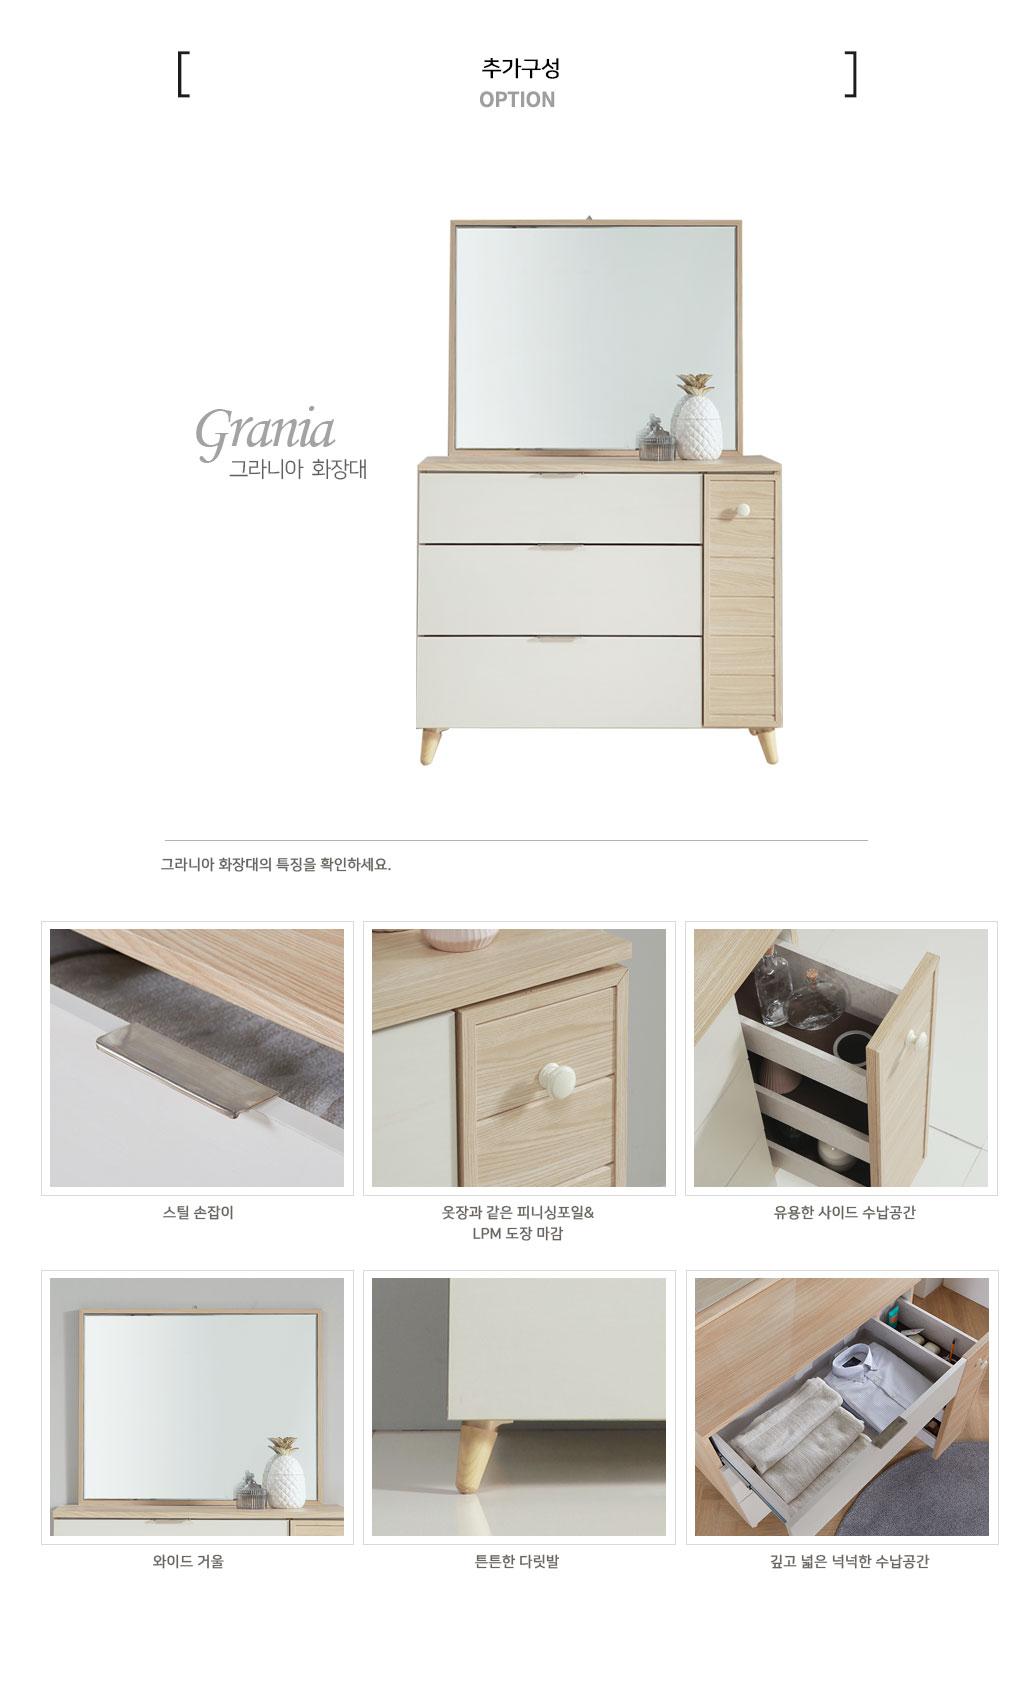 grania_10.jpg